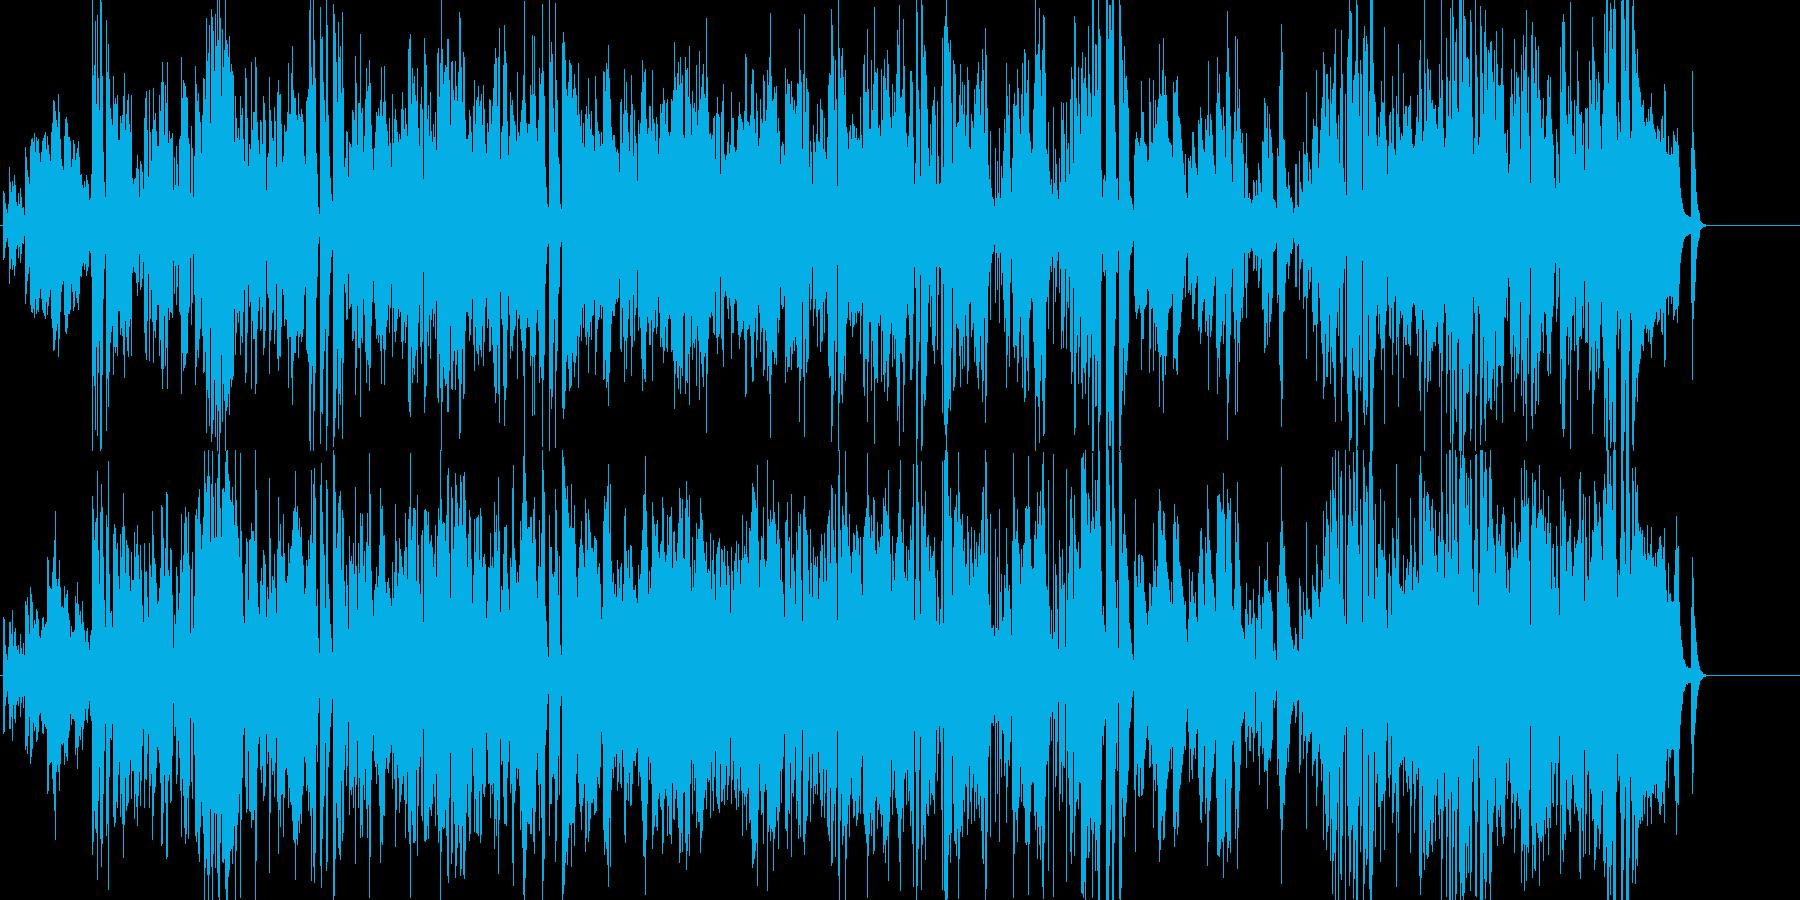 JAZZトリオ♪お洒落CaféBGM風の再生済みの波形